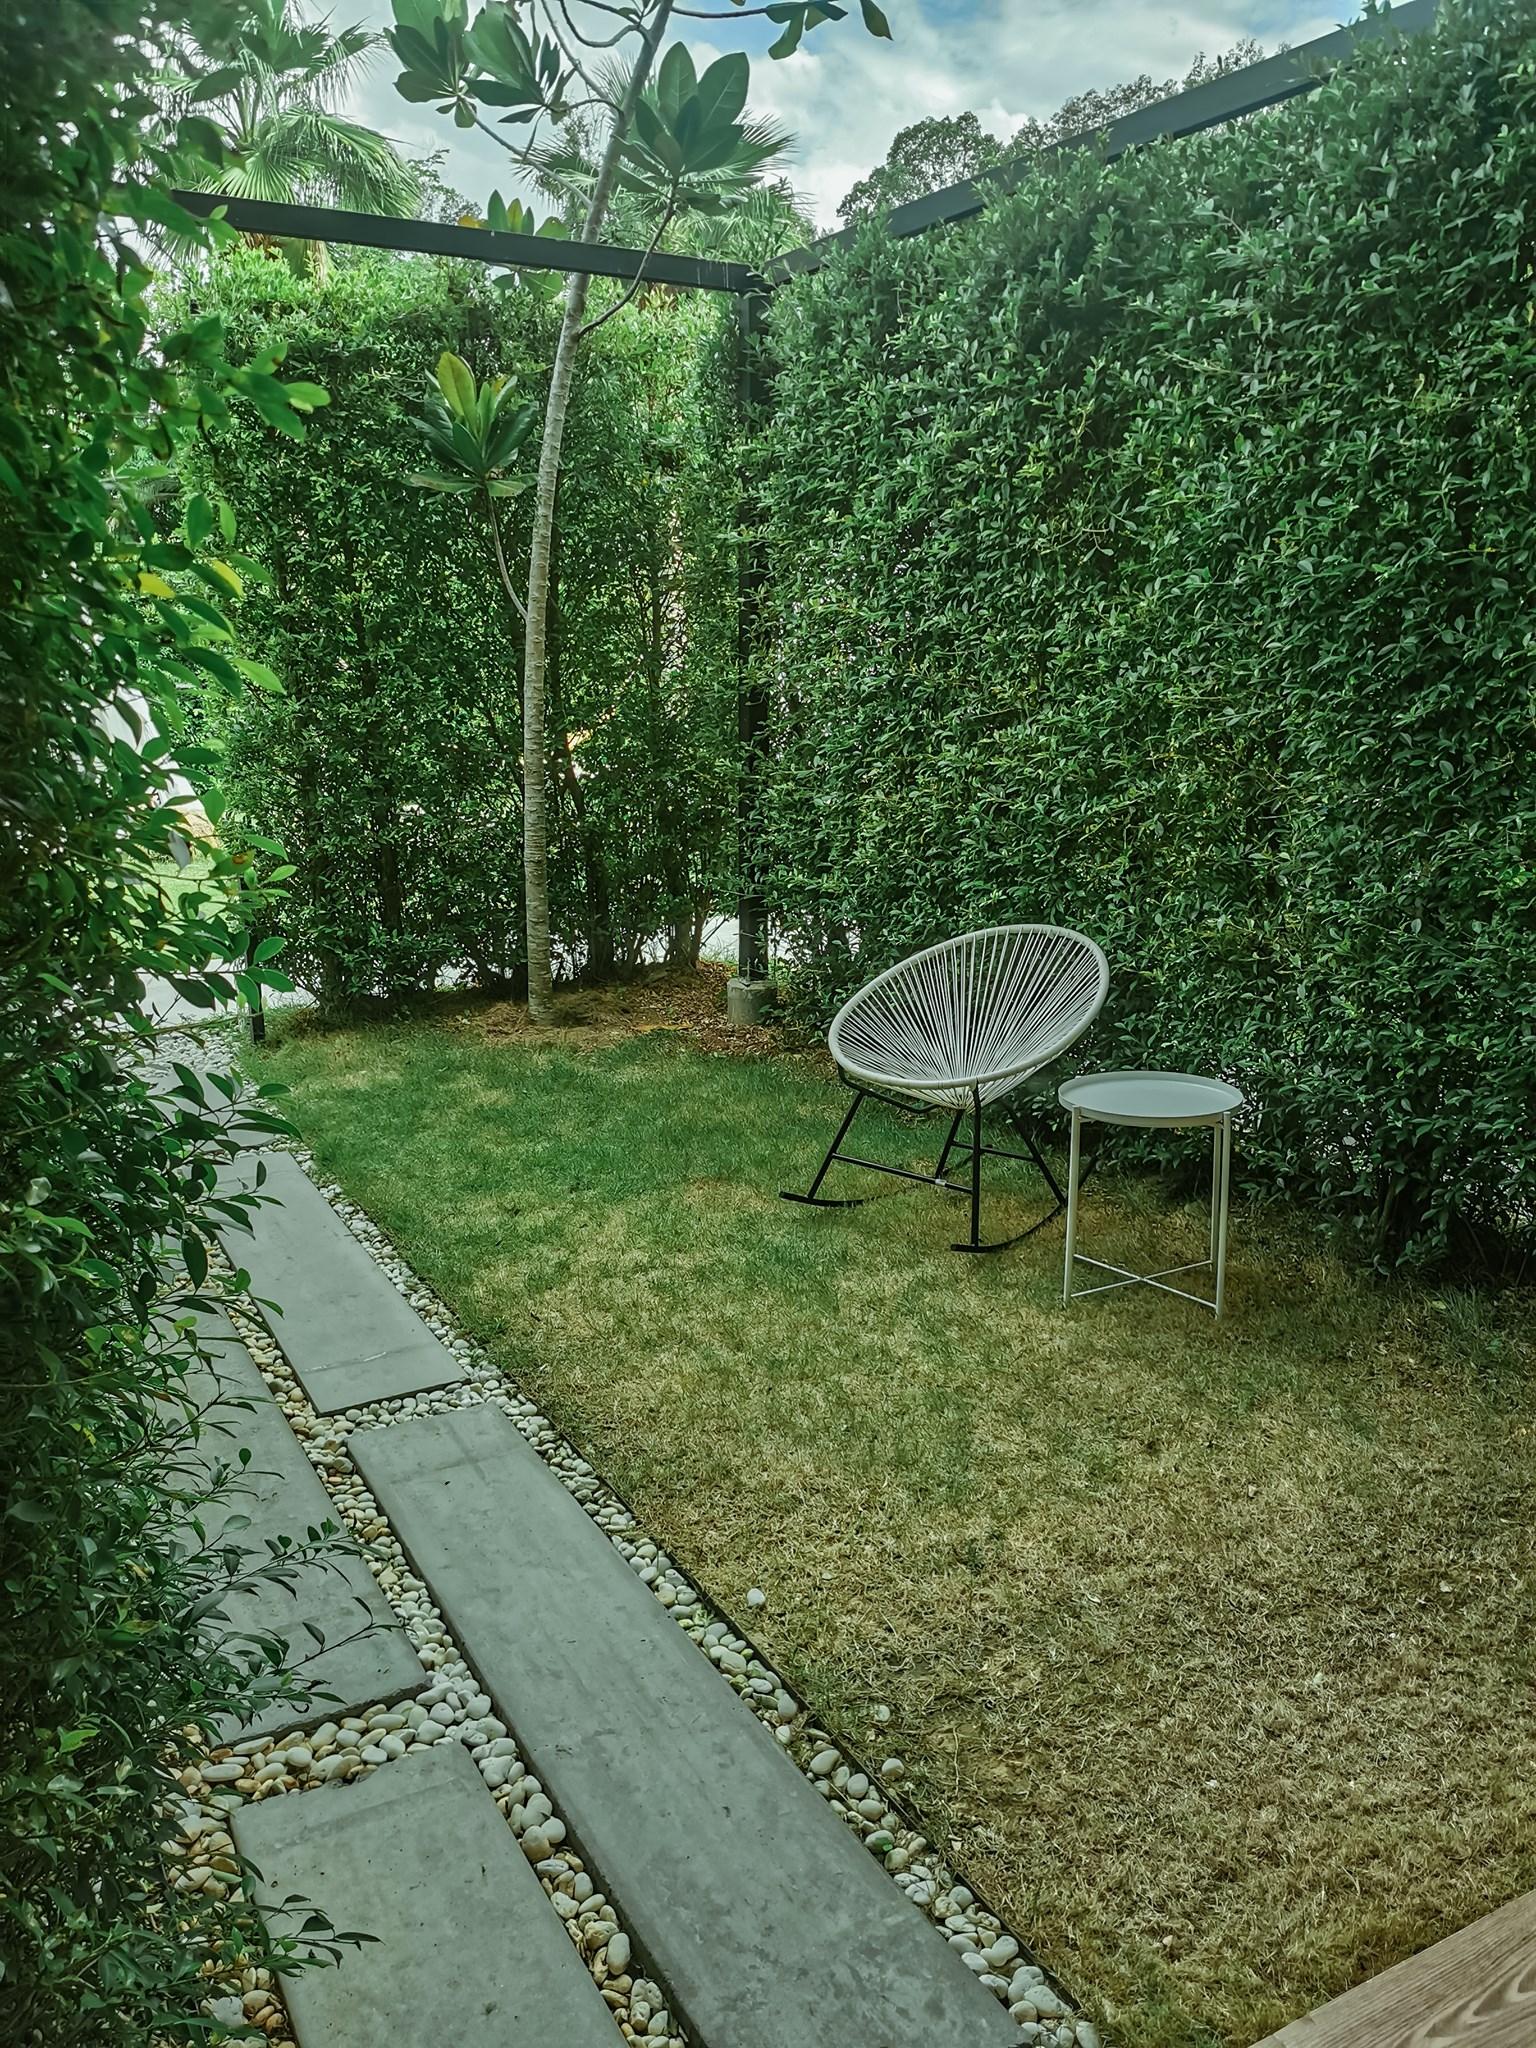 The Peem Hotel ที่พักสไตล์บาหลี สวยมินิมอลแบบโมเดิร์นมีสวนด้วย